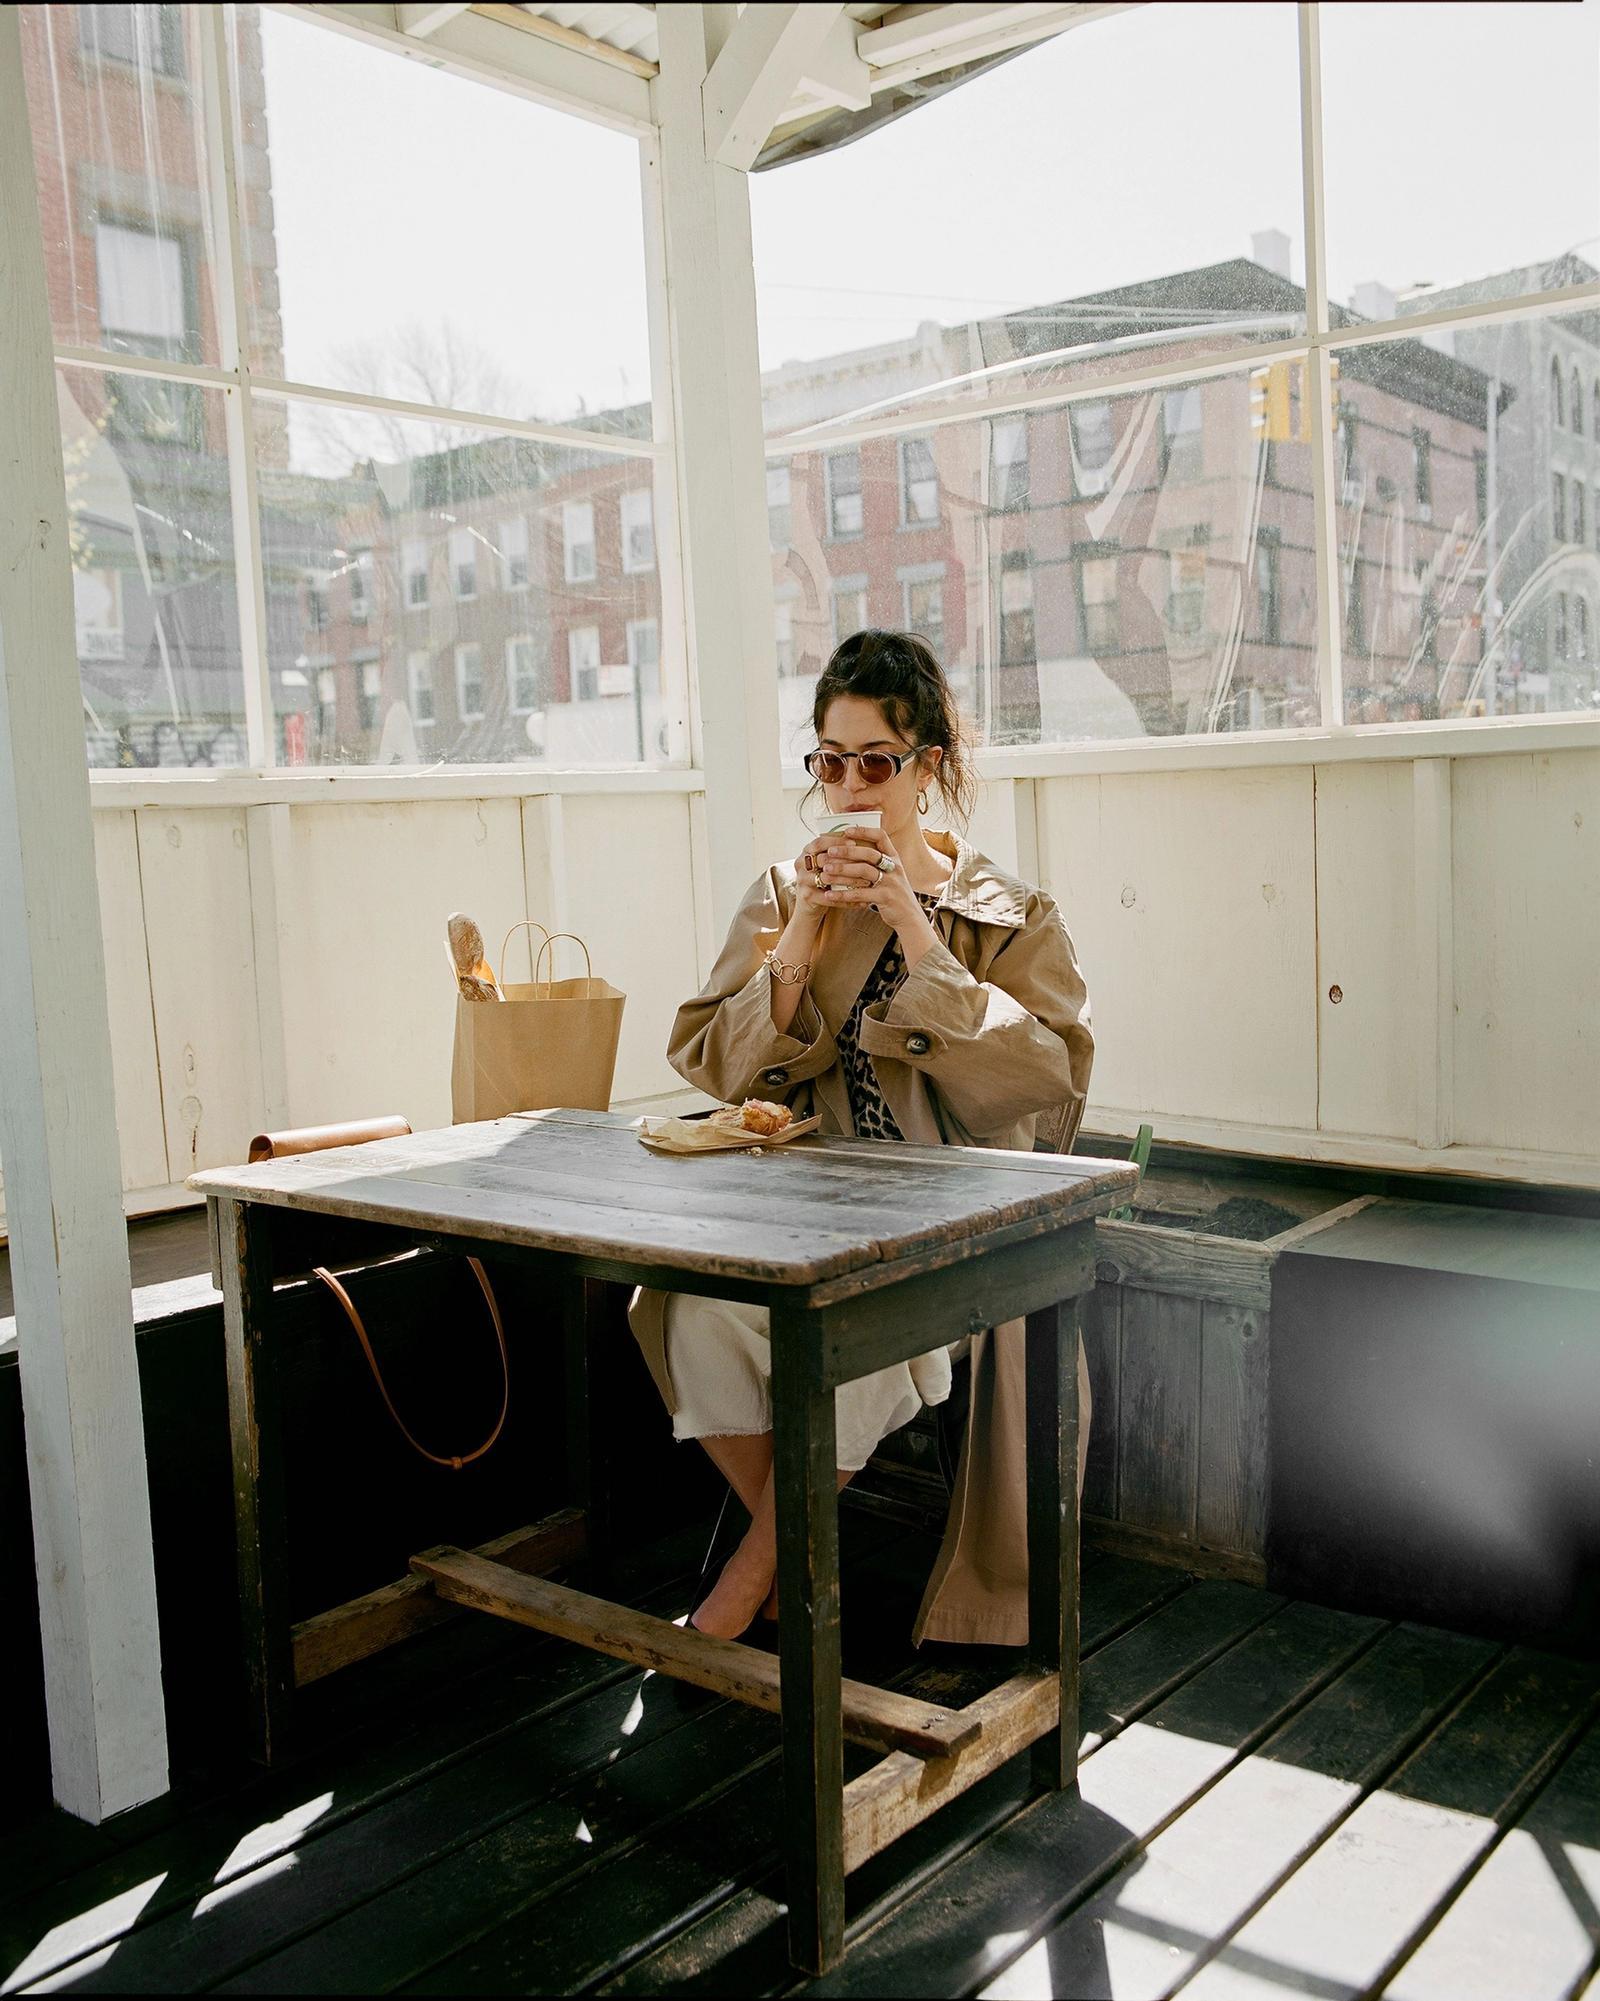 anna polonsky drinking coffee at SARAGHINA BAKERY